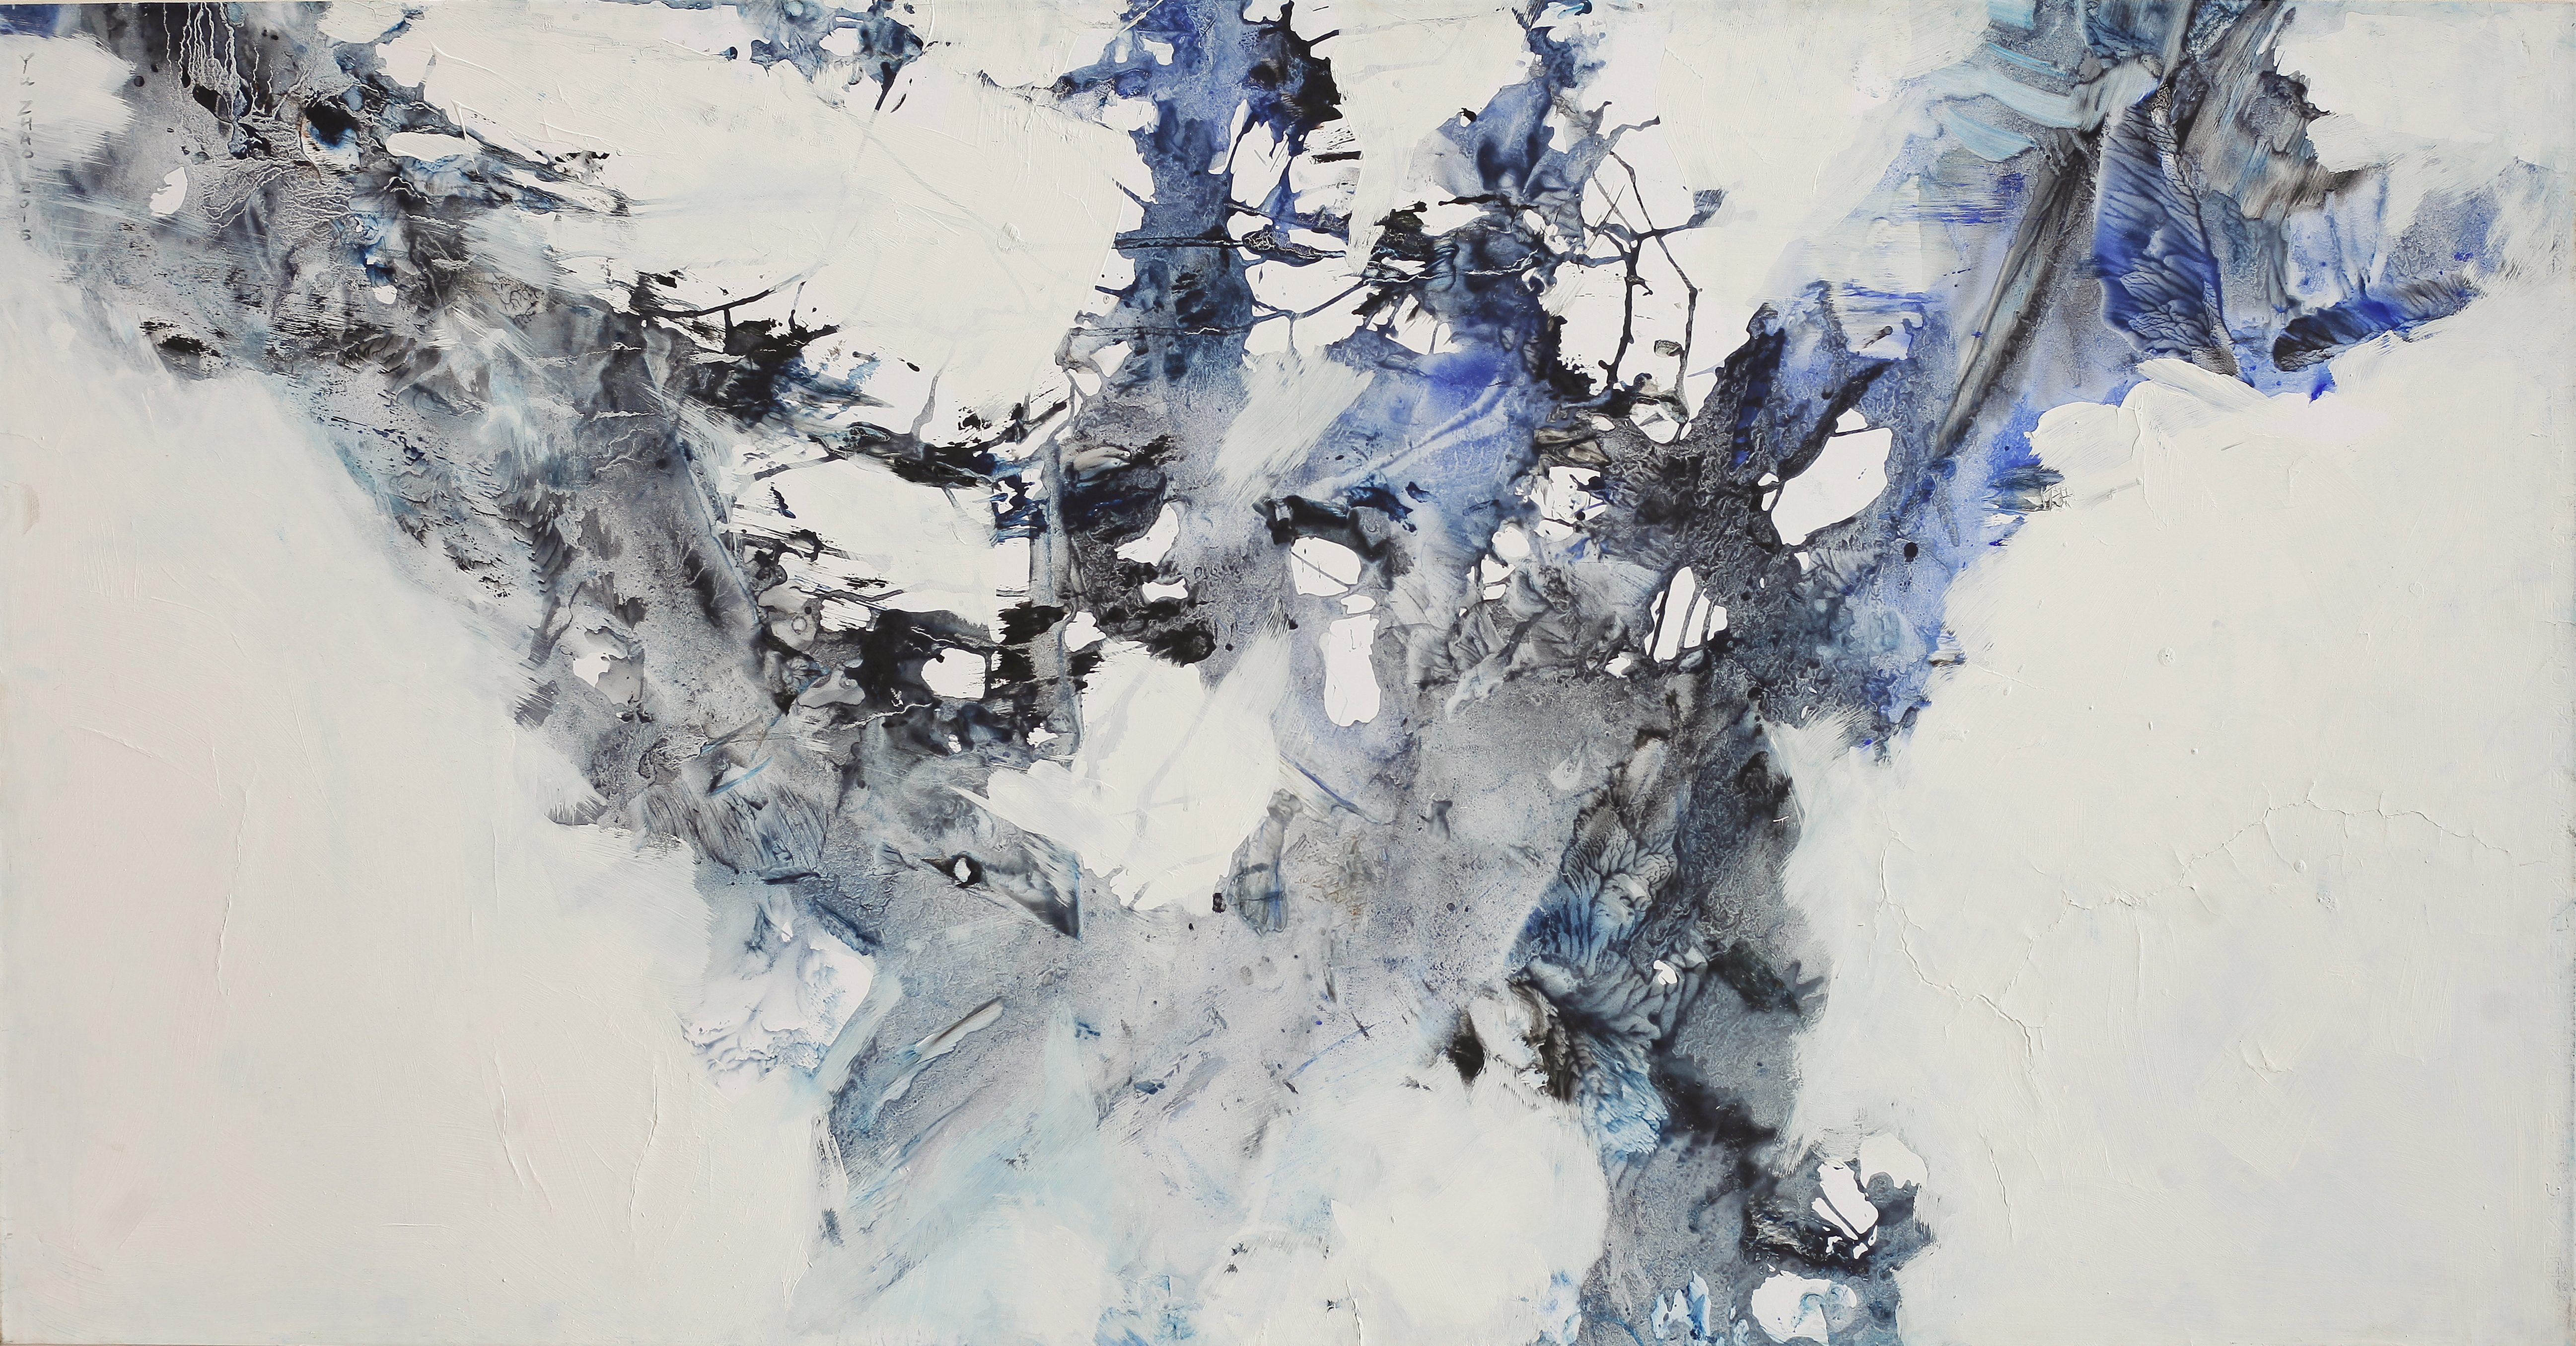 Vent-Neige-Arbre, tempera/paper/canvas, 150x75cm, 2015, Yu Zhao